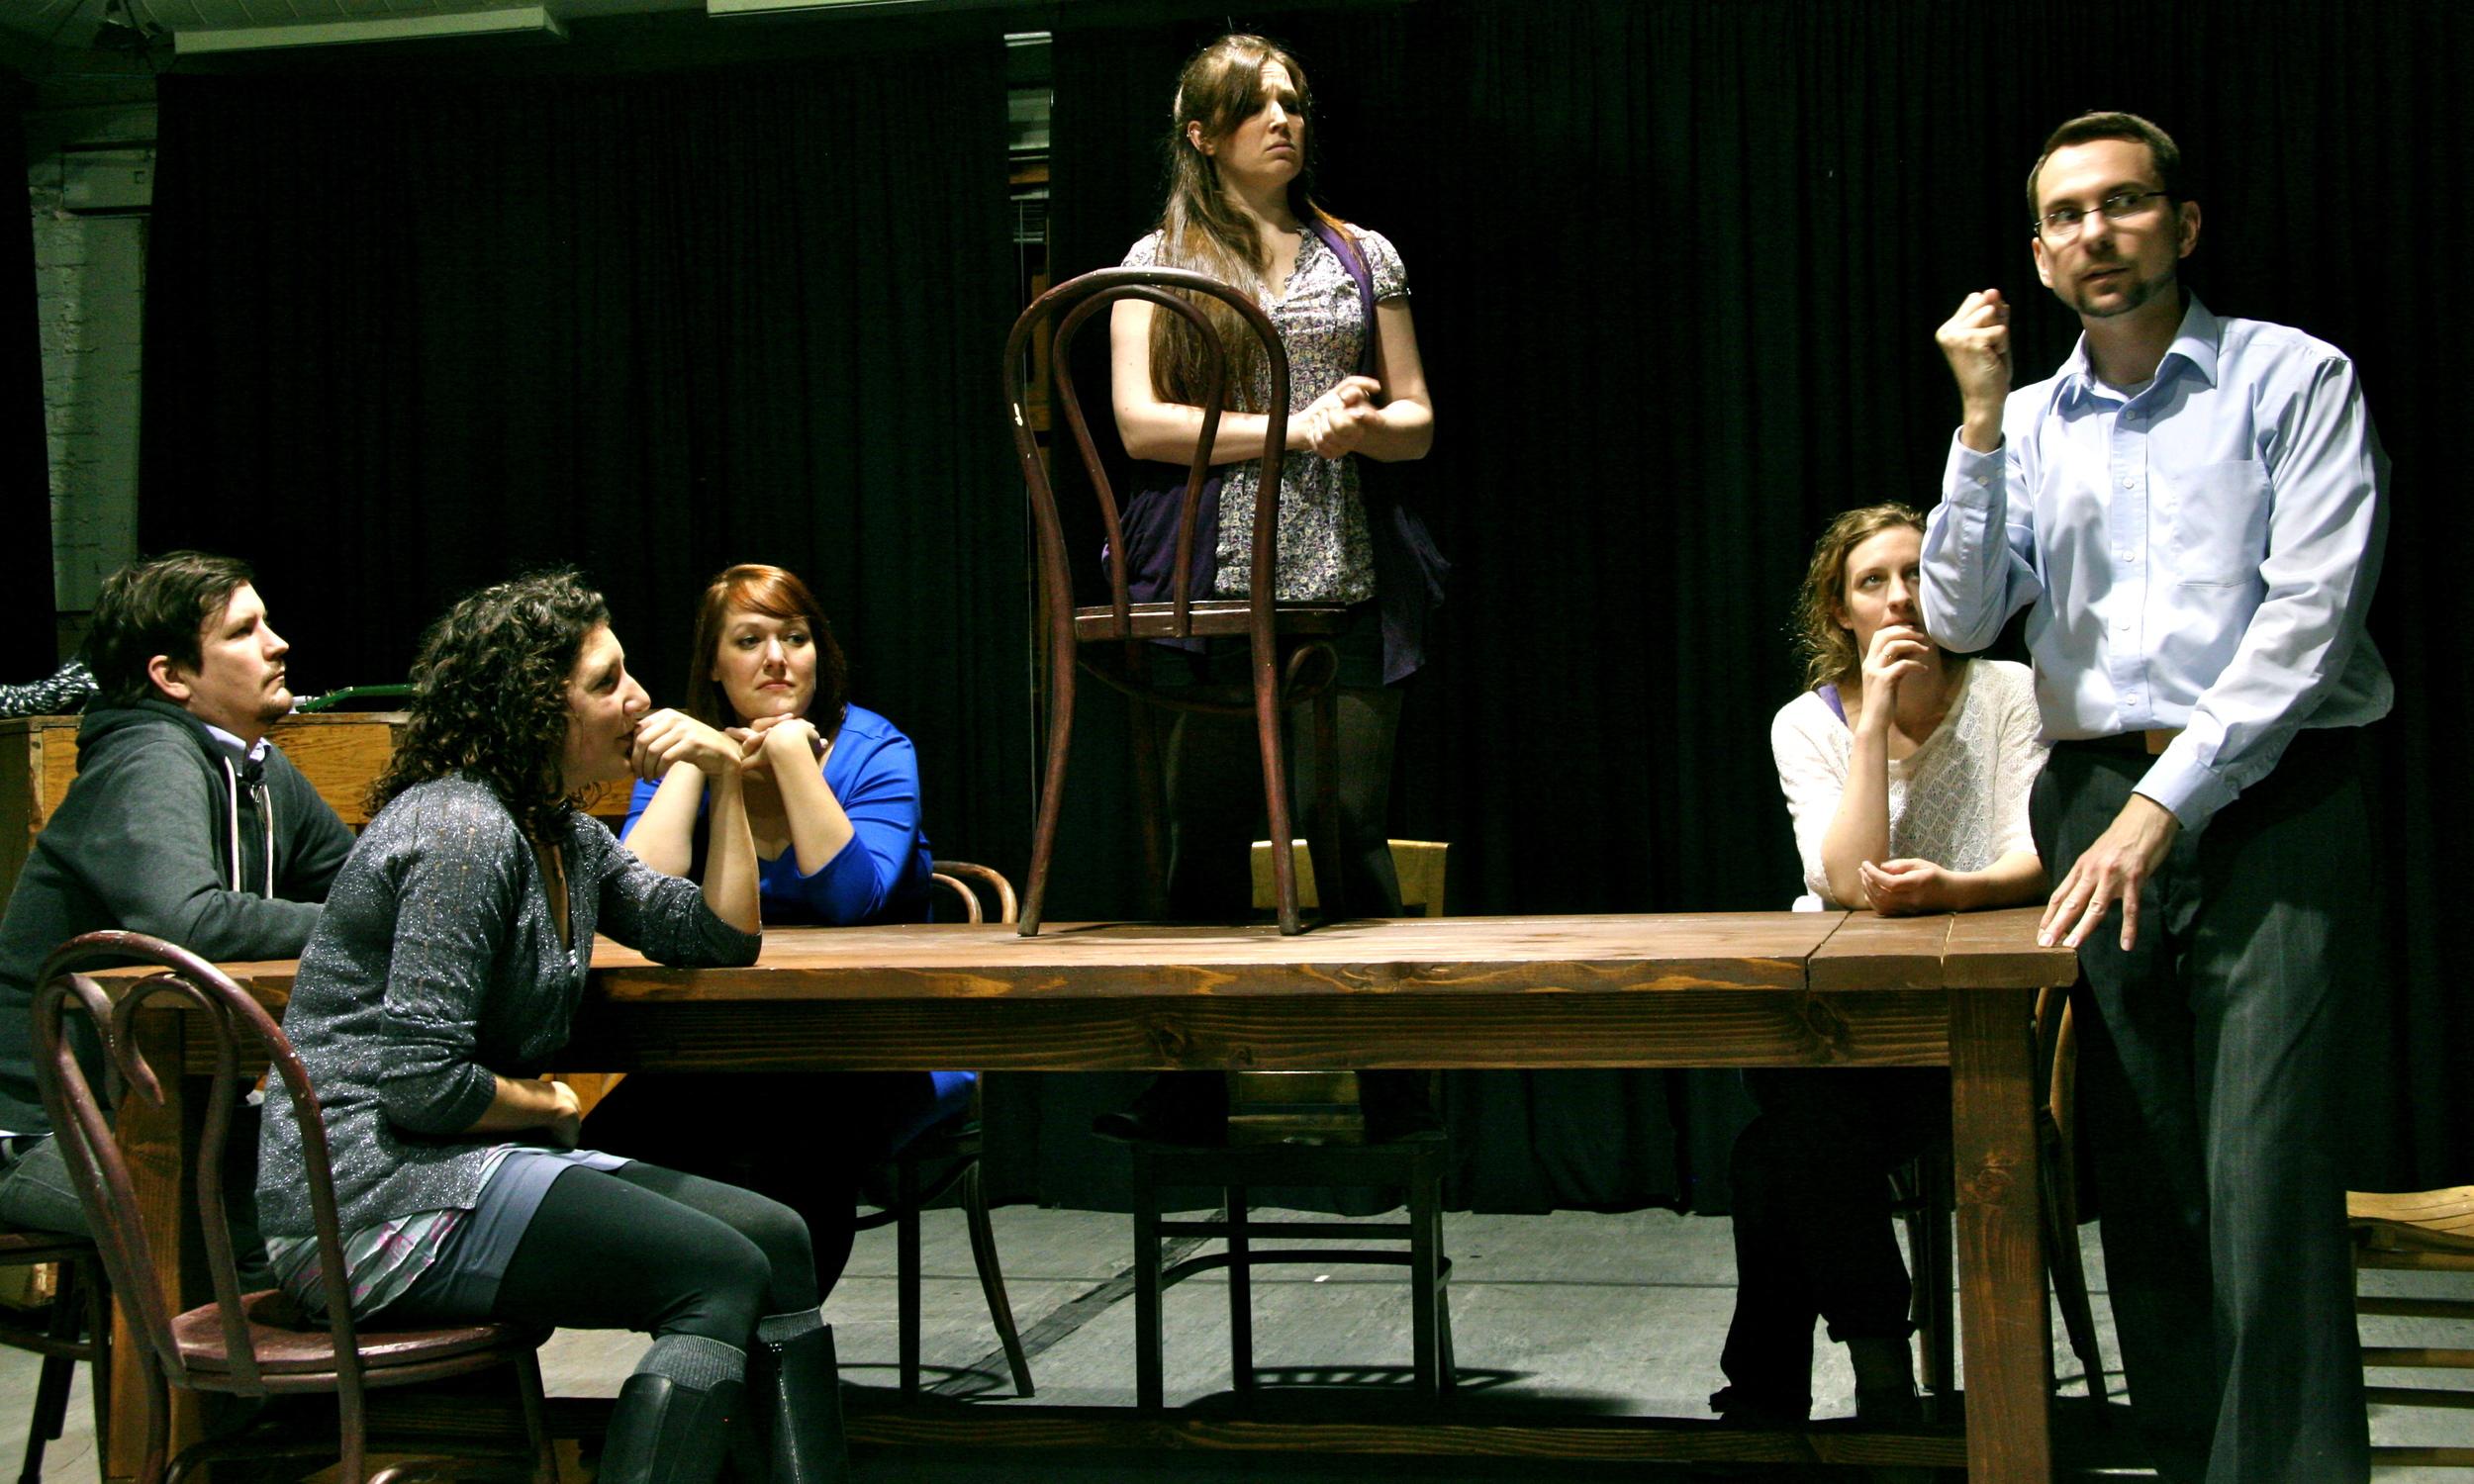 James Dunn, Sara Jean McCarthy, Amber Gerencher, Kristen T. King, Erika Haaland, Jack Dugan Carpenter, (Photo by Jasmine ~1.JPG